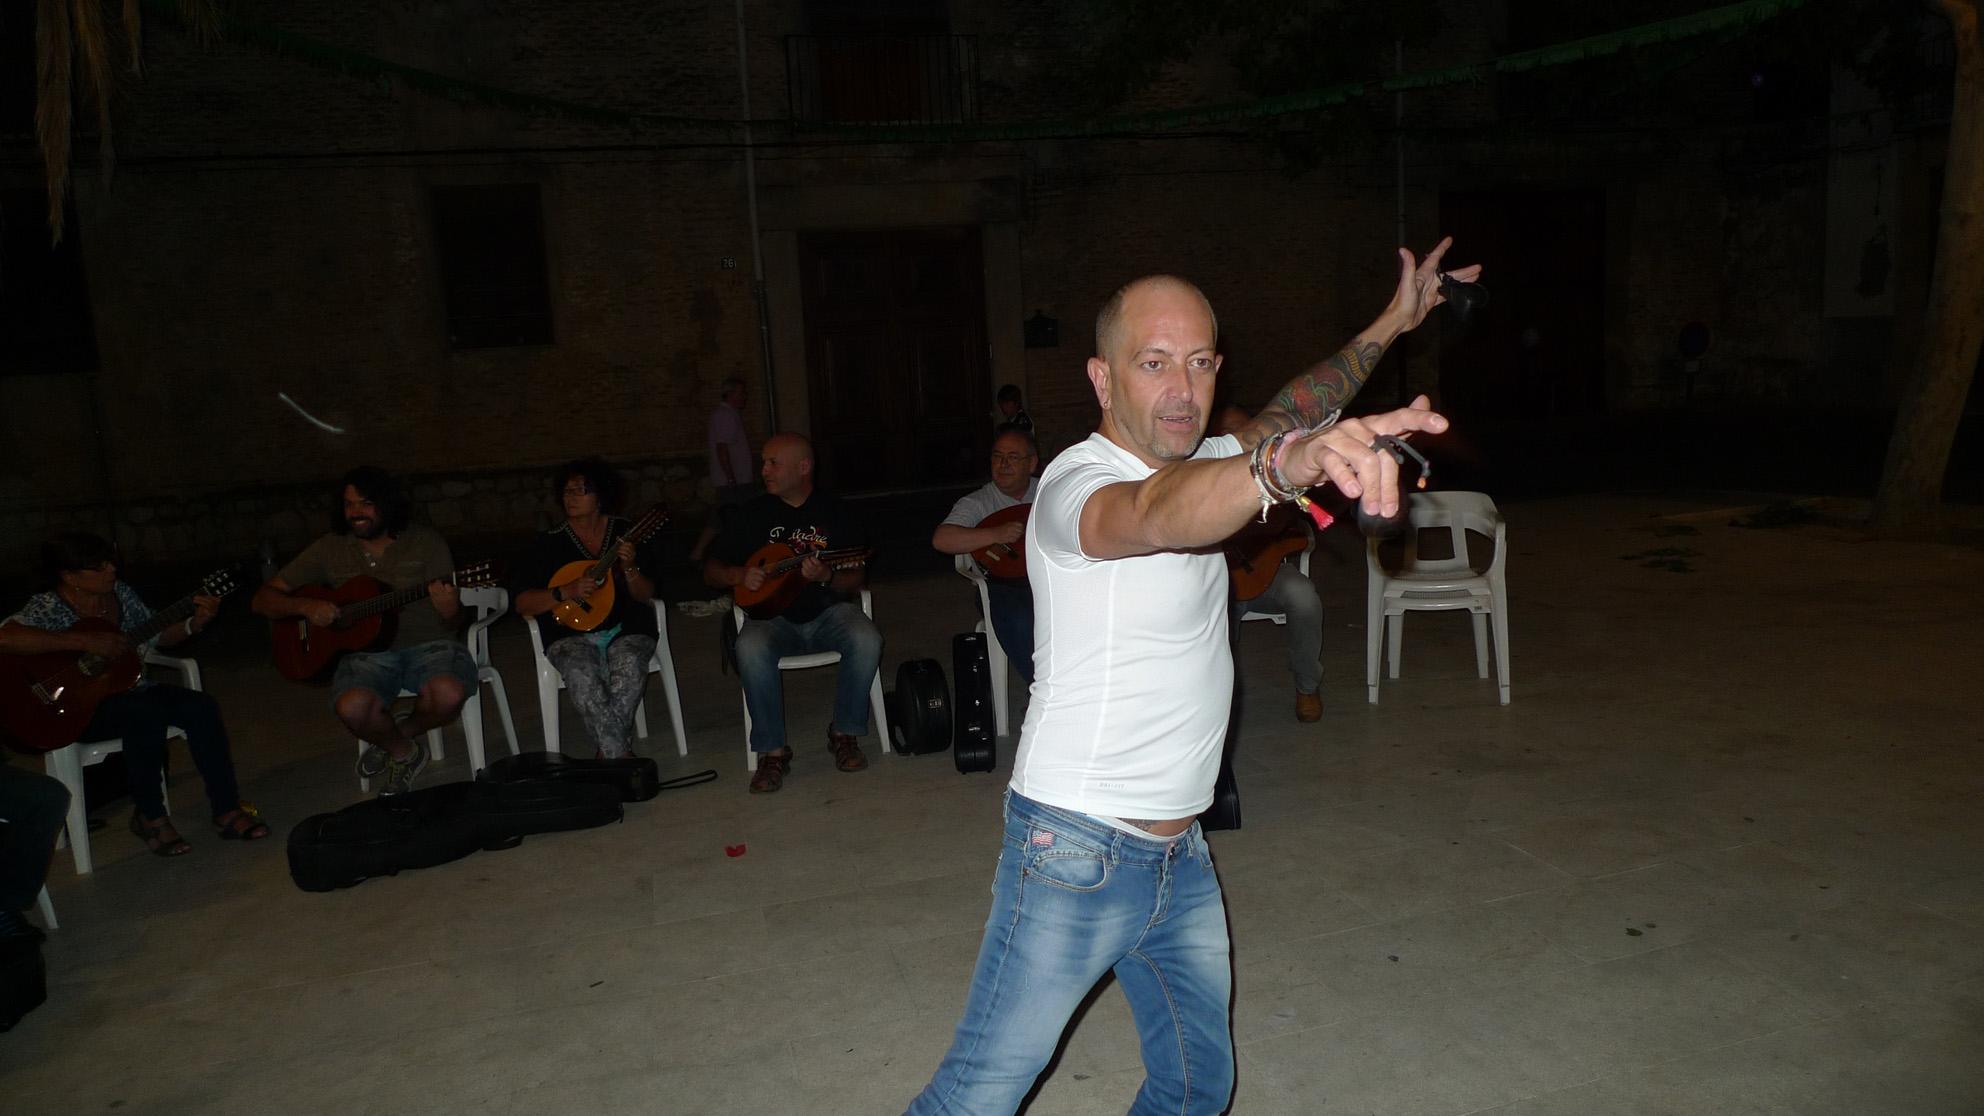 2014-07-20 PalacioDansetesPalacio i Albaes (72)